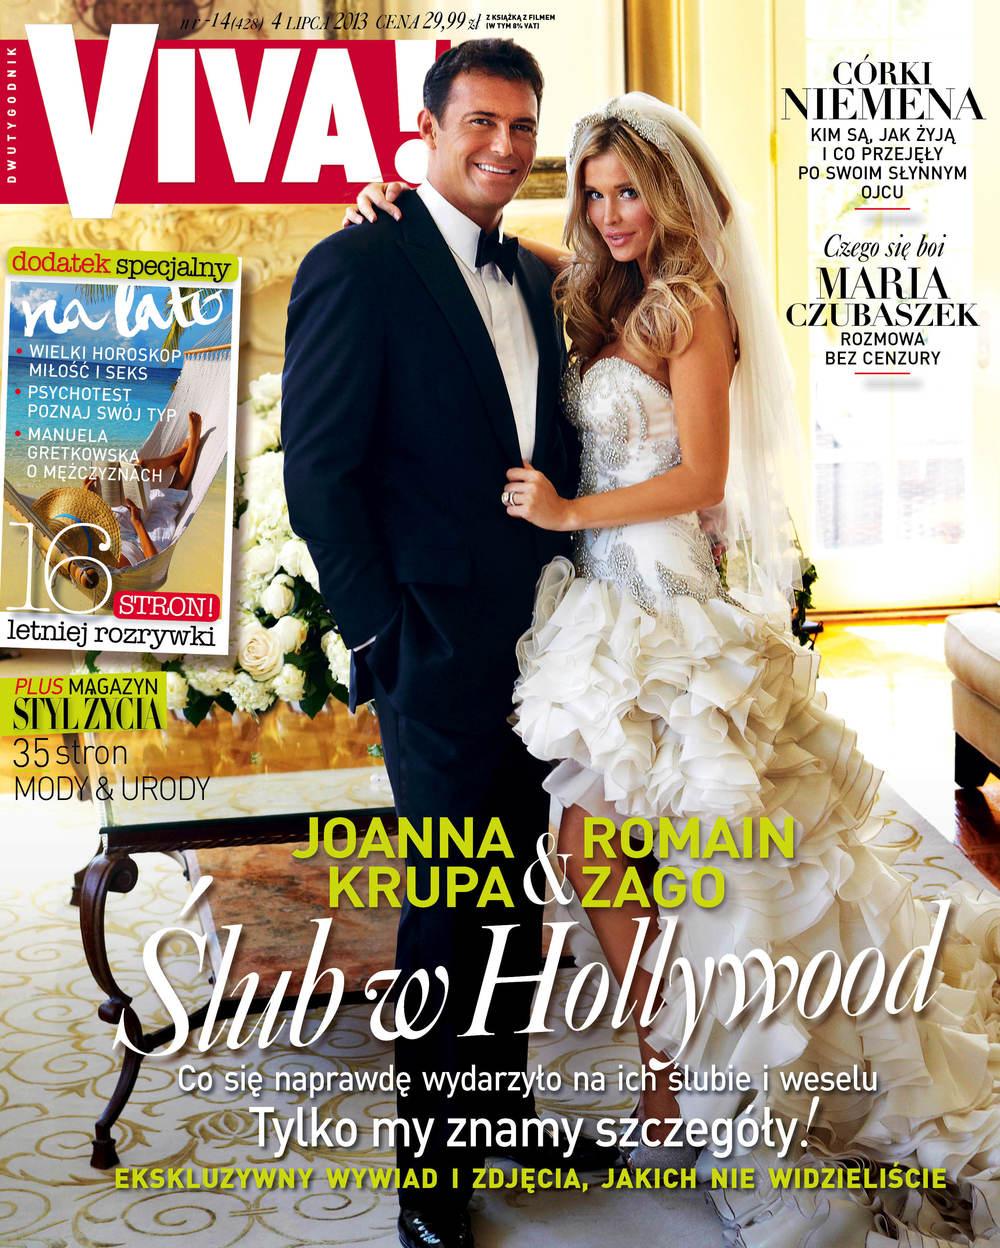 ViVA Magazine  w/Joanna Kruppa